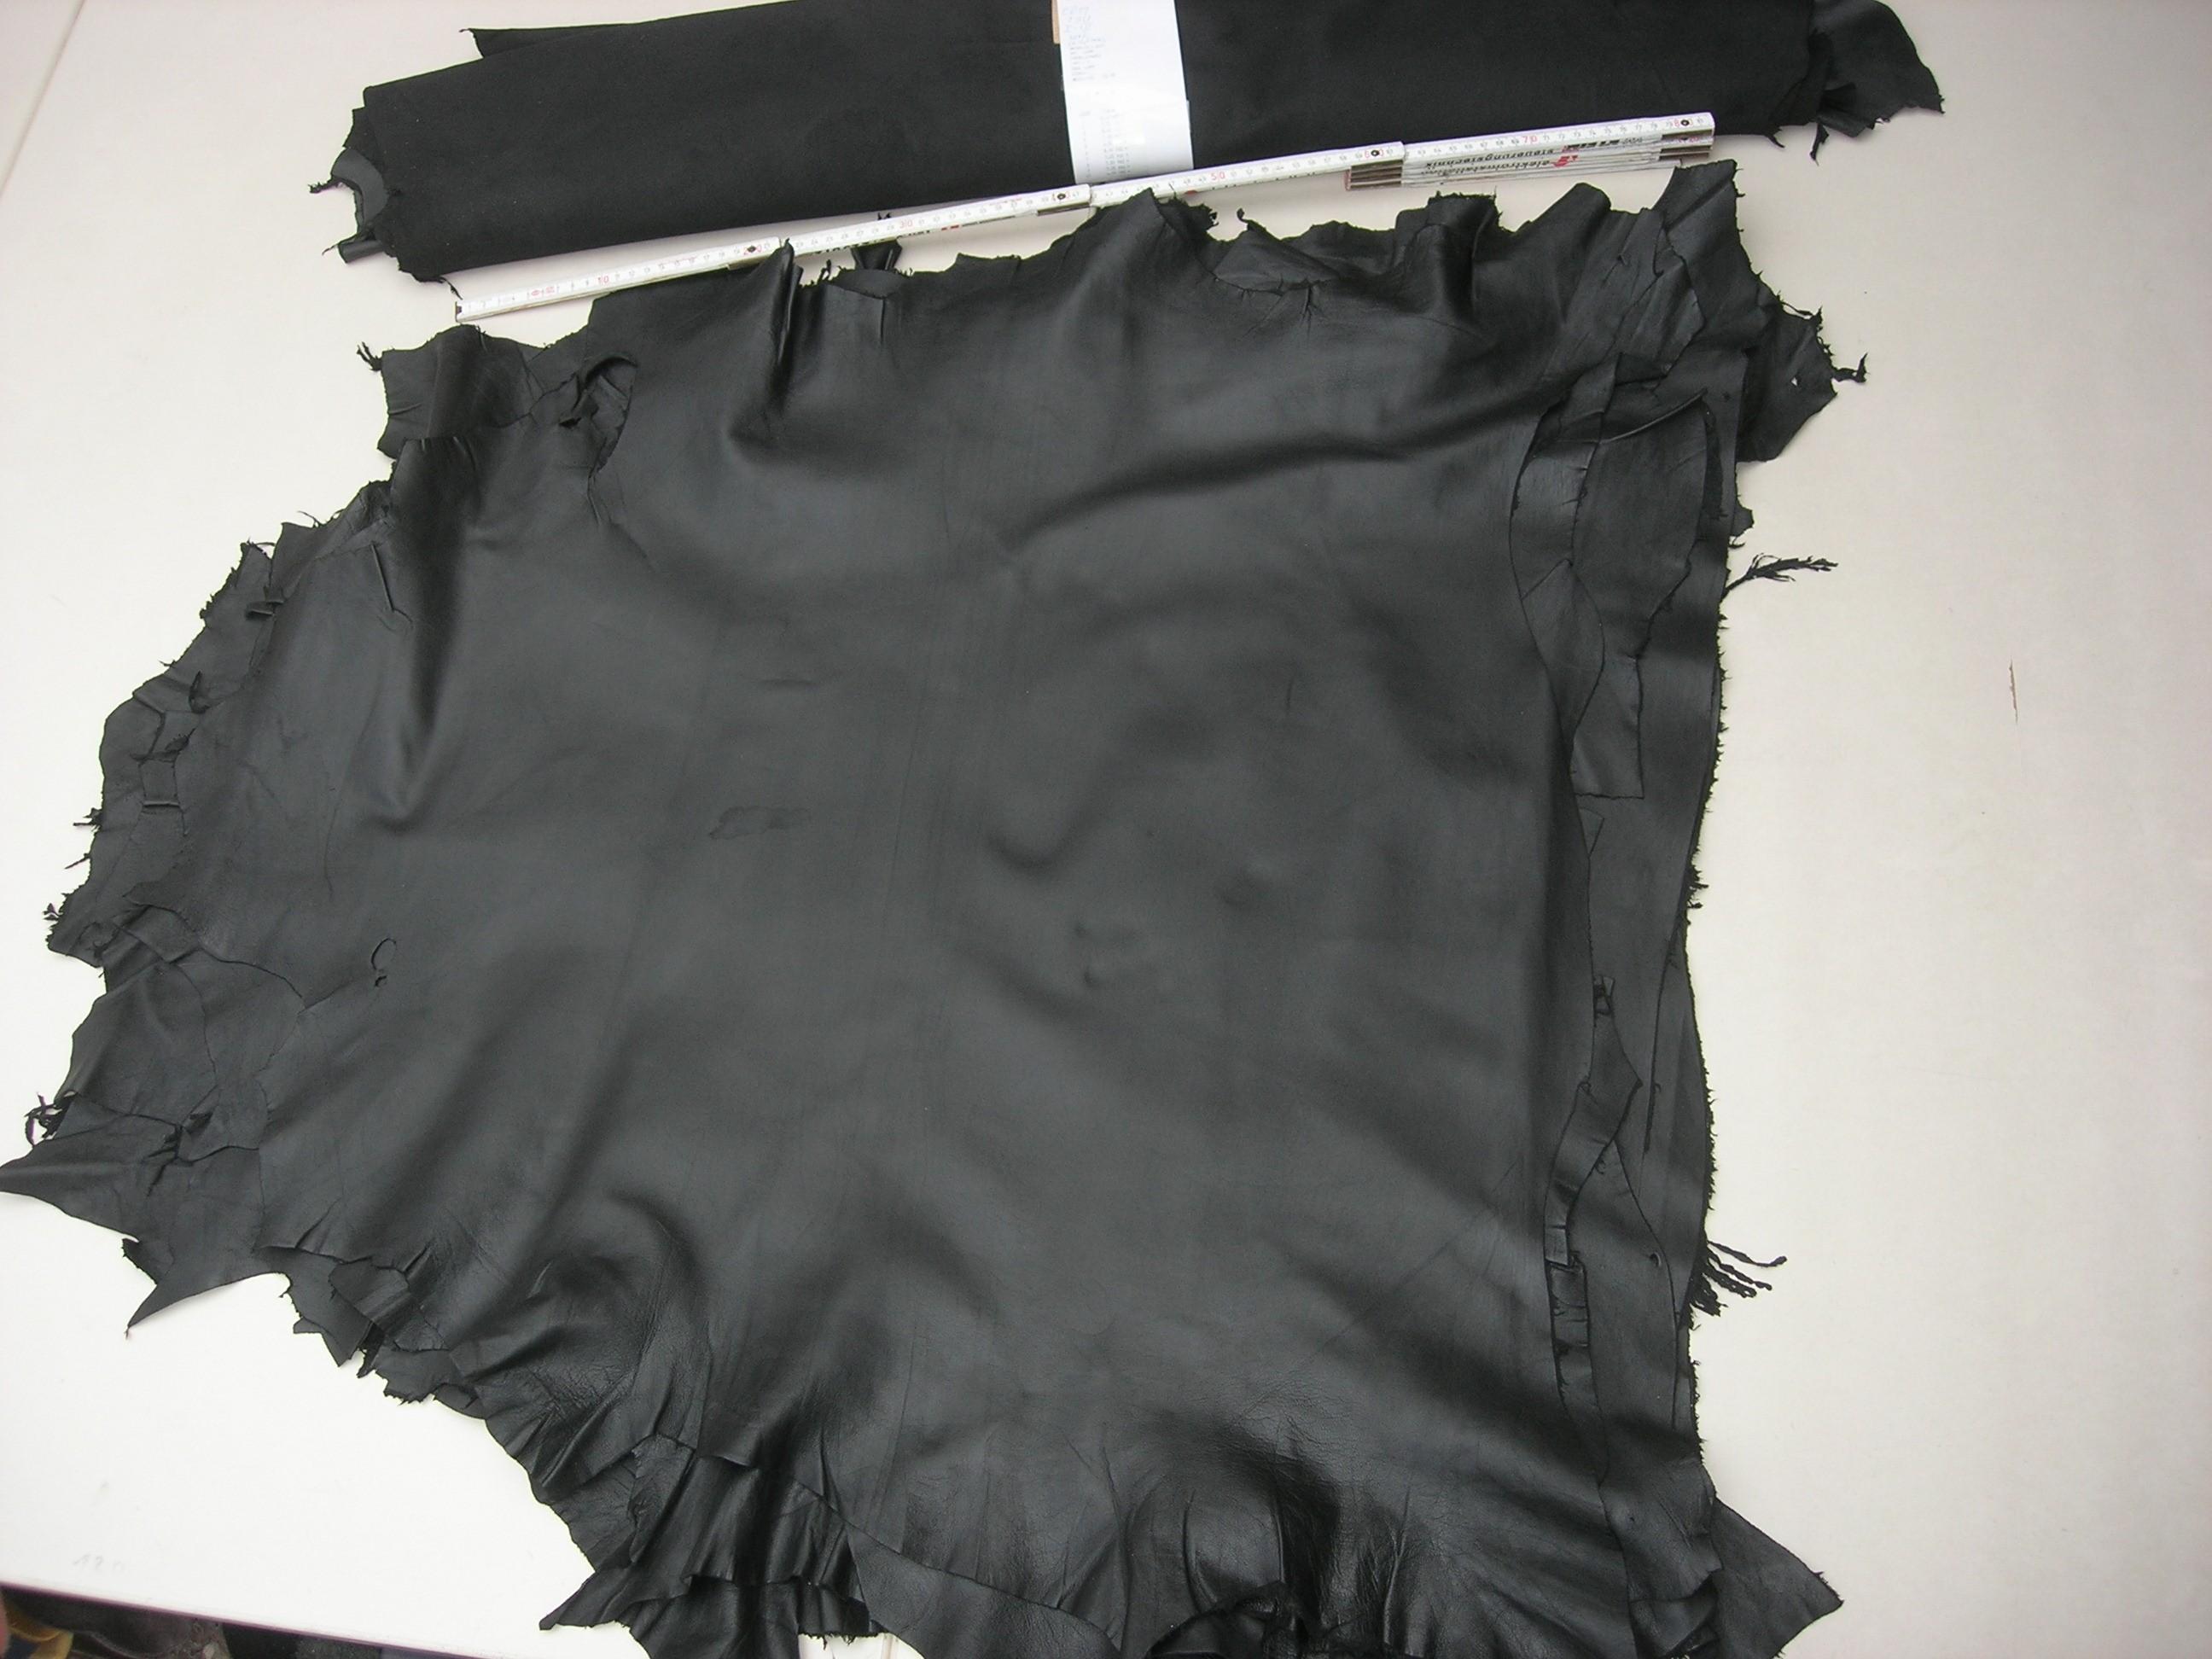 Lammnappa schwarz 2.-3.Sortiment (ER19150) 0,4 - 0,7 mm